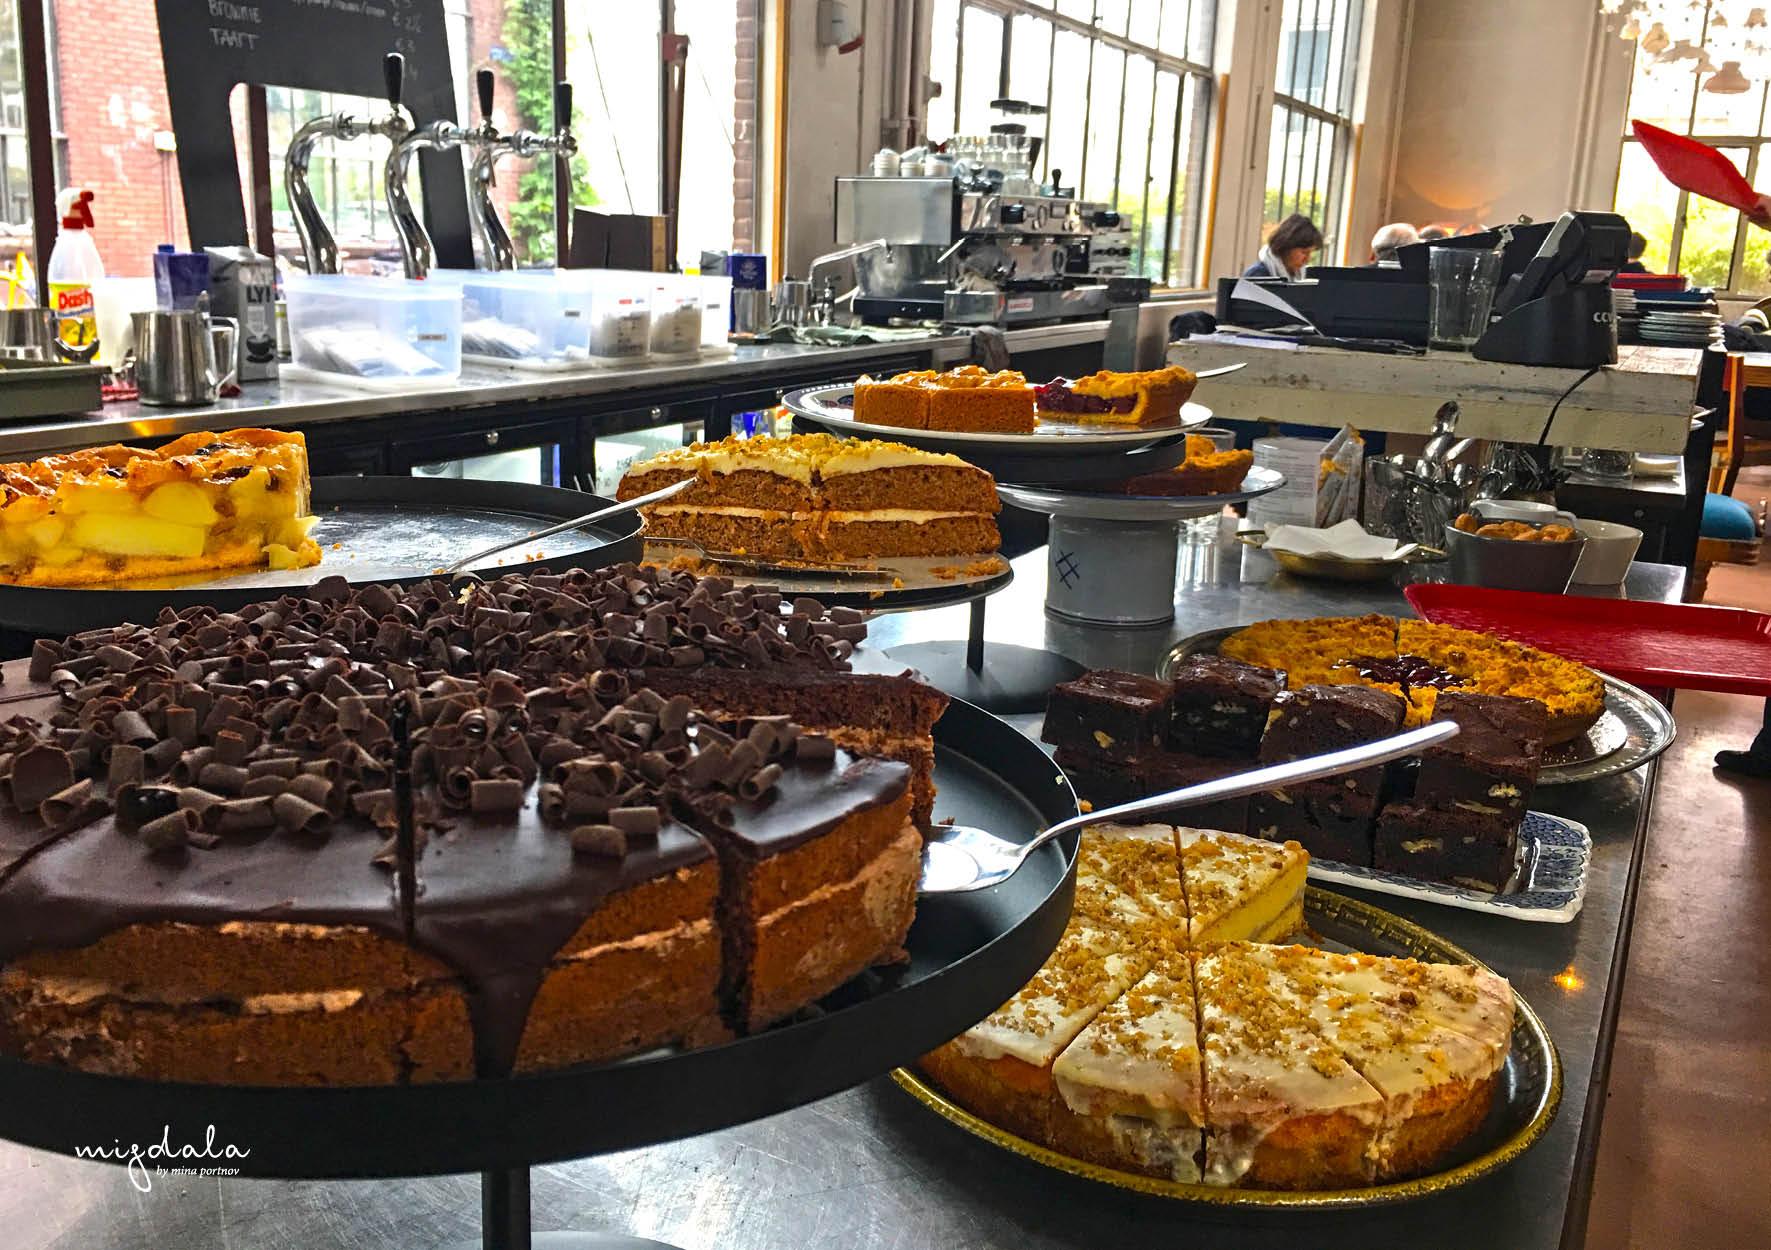 https://www.instagram.com/restaurantpietheineek/ מסעדה משובחת - עוגות שאין דברים כאלו!